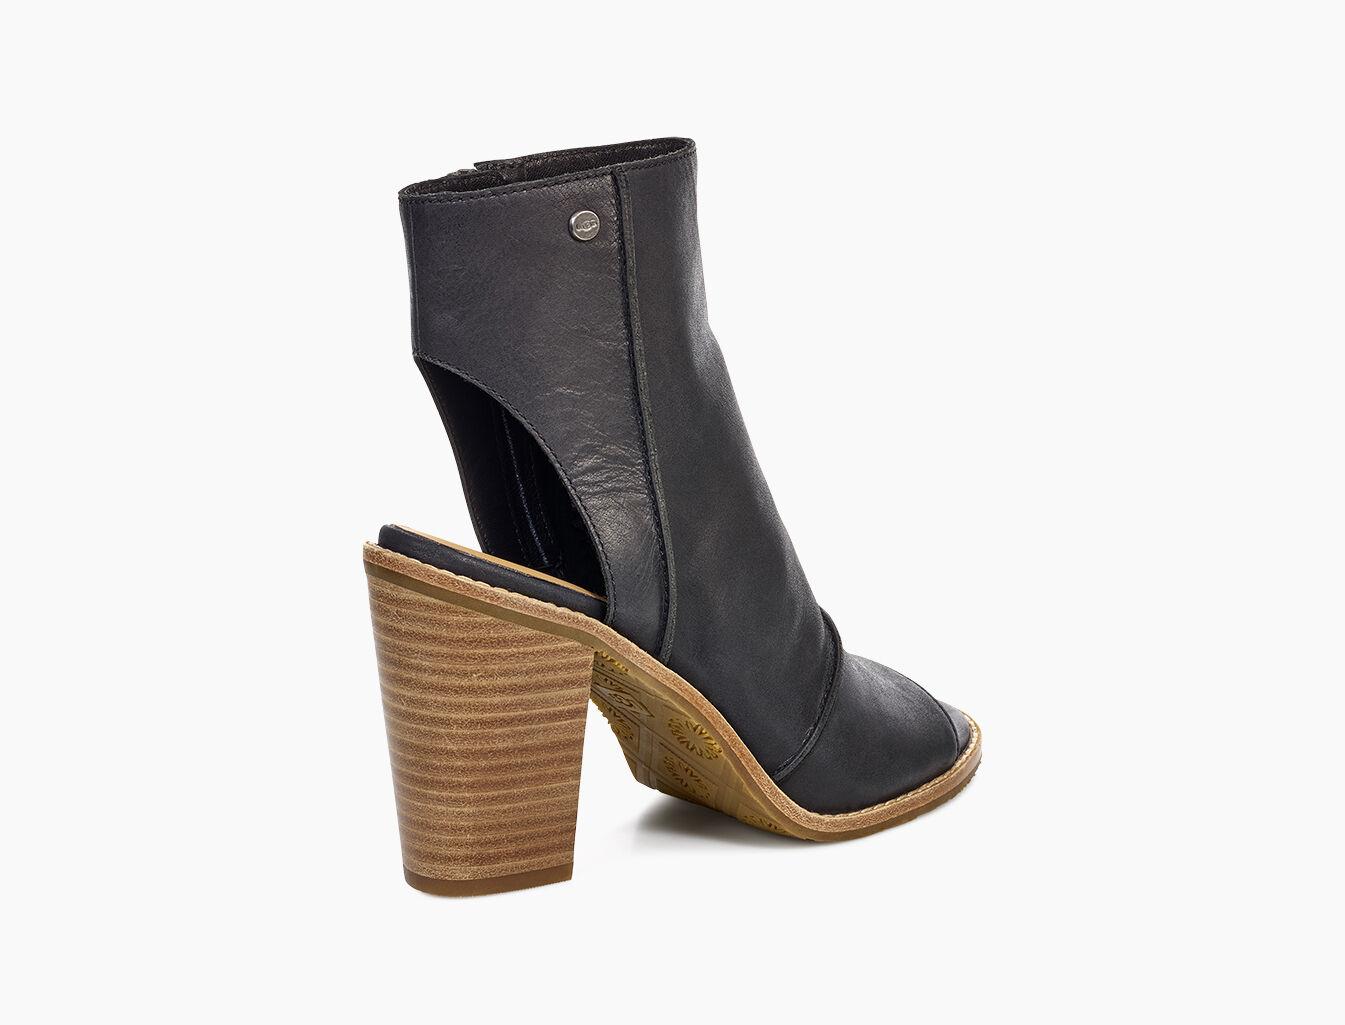 79bb0173ec9 Huge Deal on Ugg Women s Abela Open Toe Sheepskin Slide Sandals